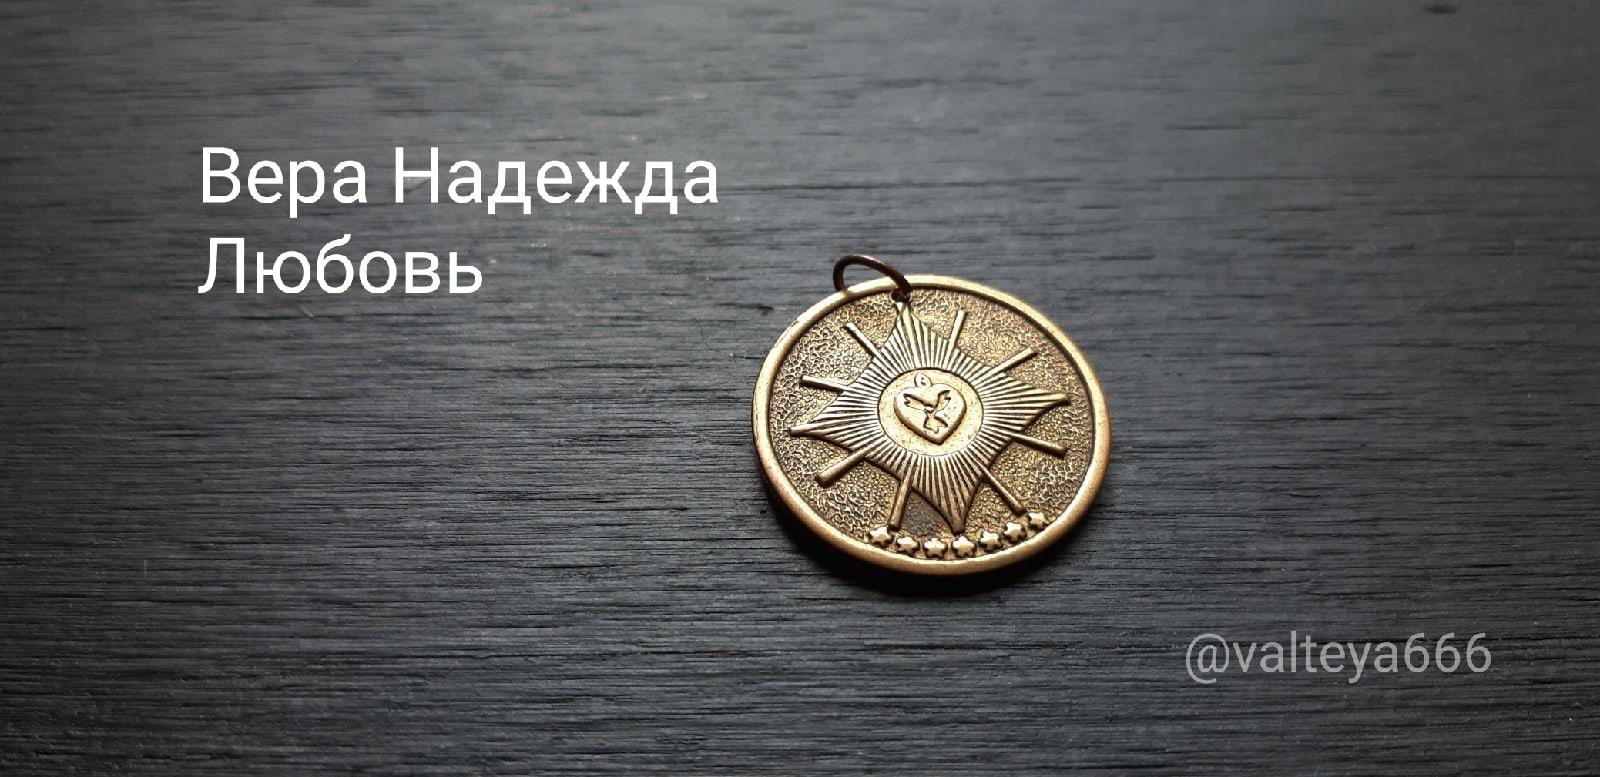 киев - Амулеты, талисманы, обереги из металла. - Страница 2 FhQwX372knI